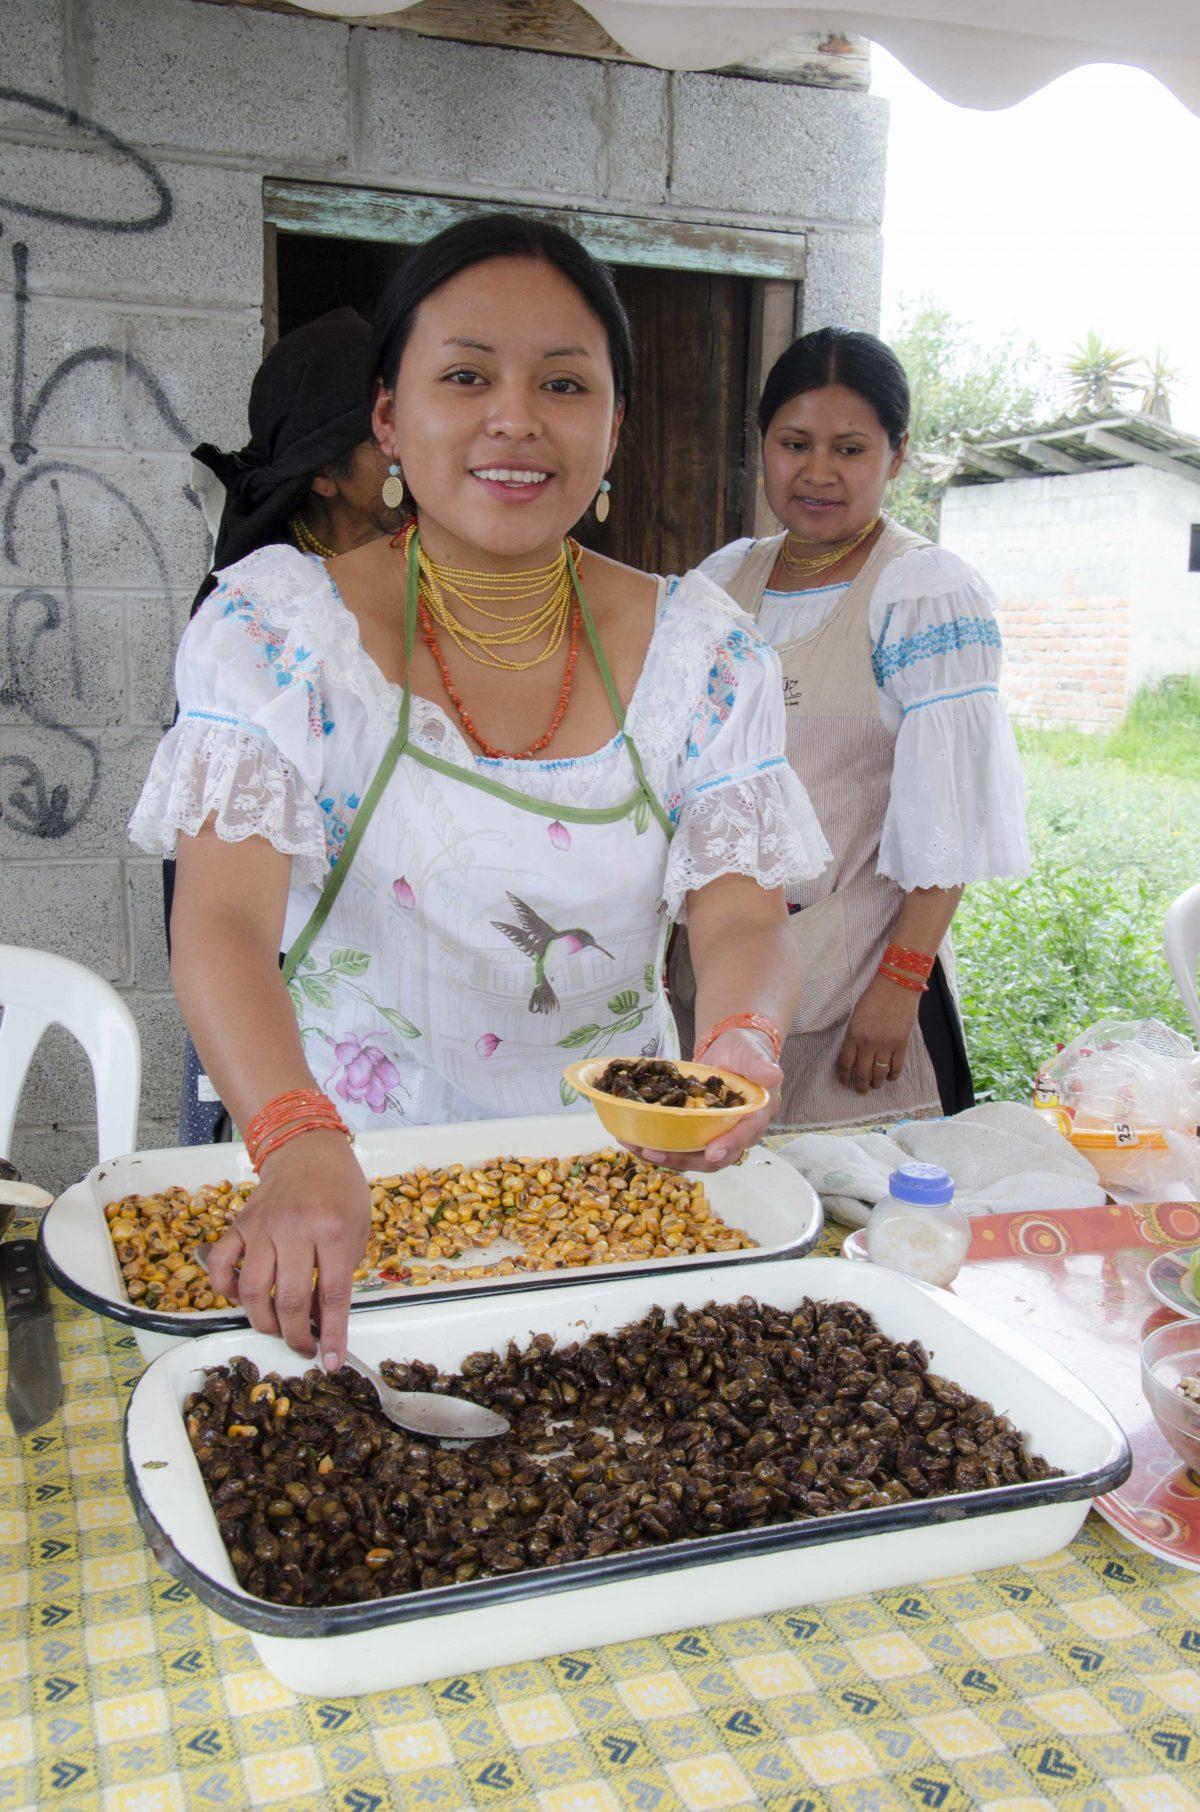 Catzos, or beetles, served in Peguche, Ecuador| ©Angela Drake